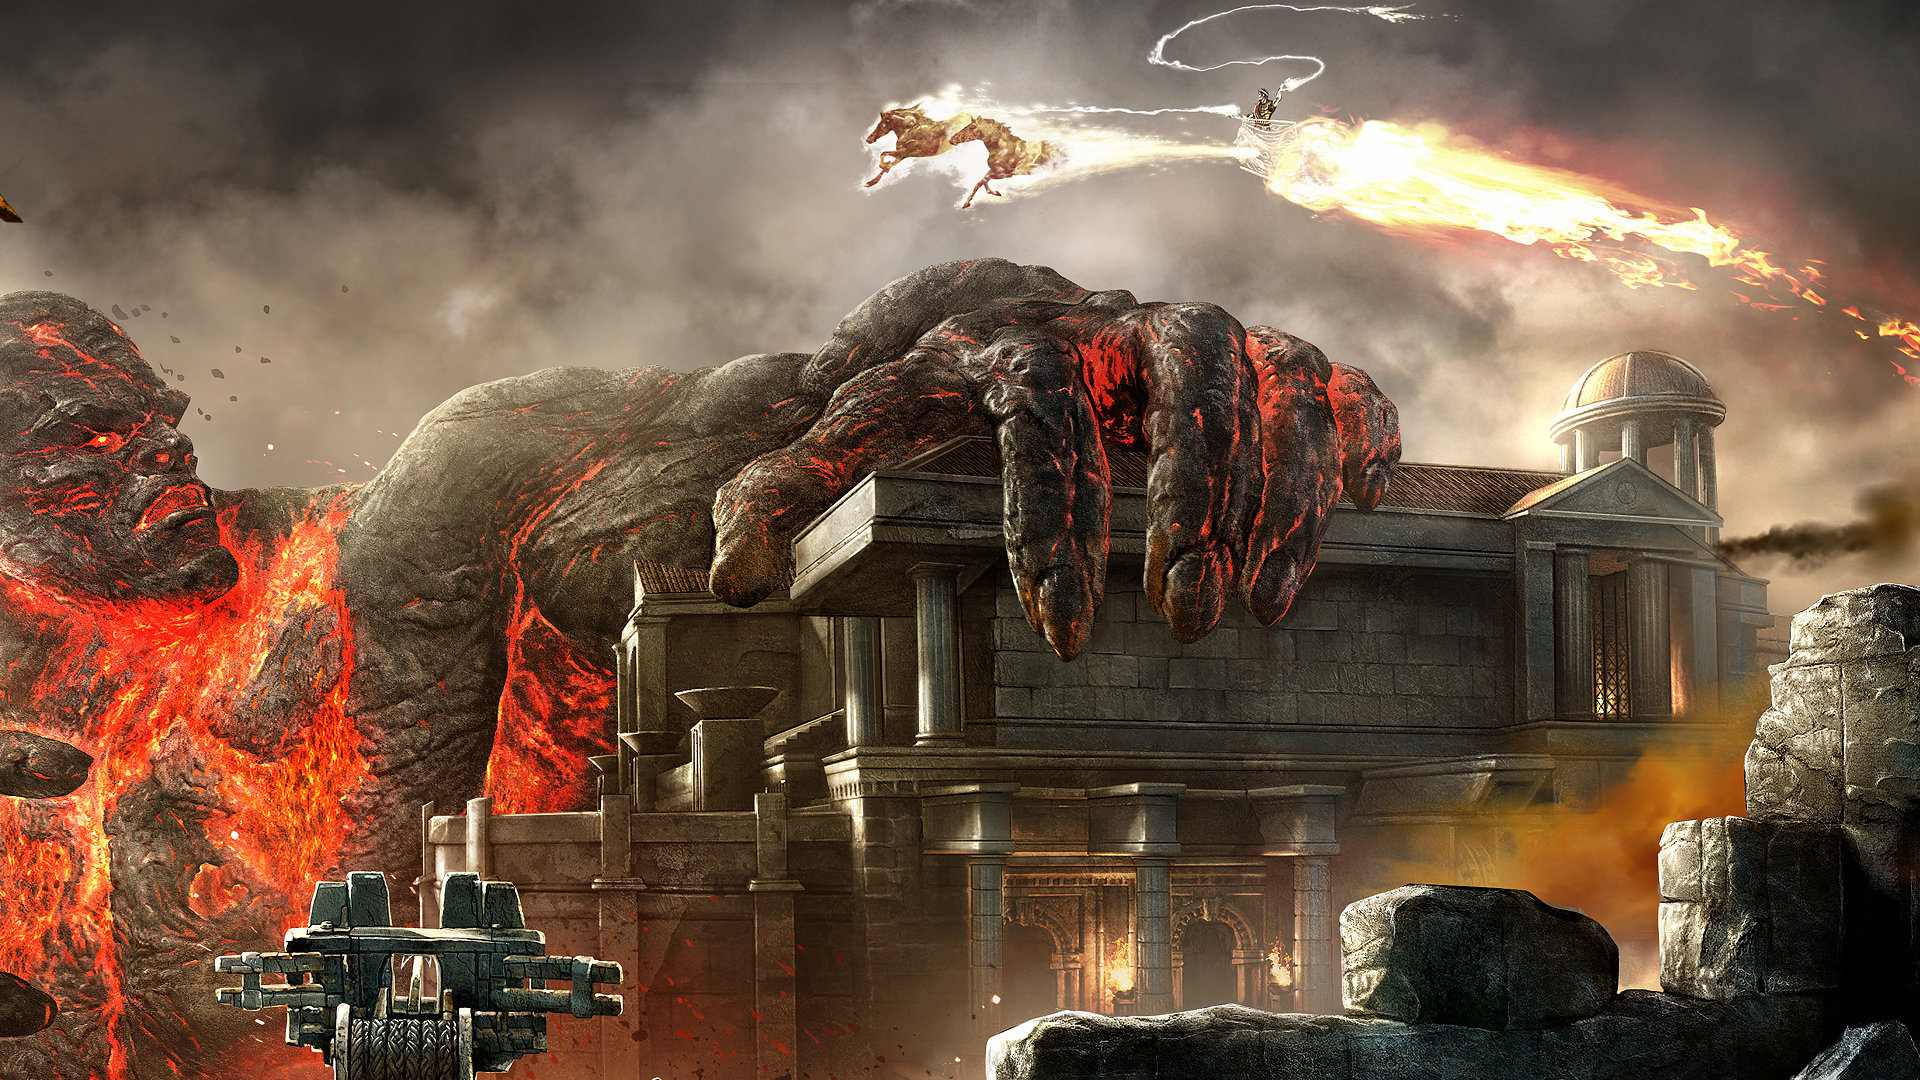 Best God Of War 3 Wallpaper Id40740 For High Resolution